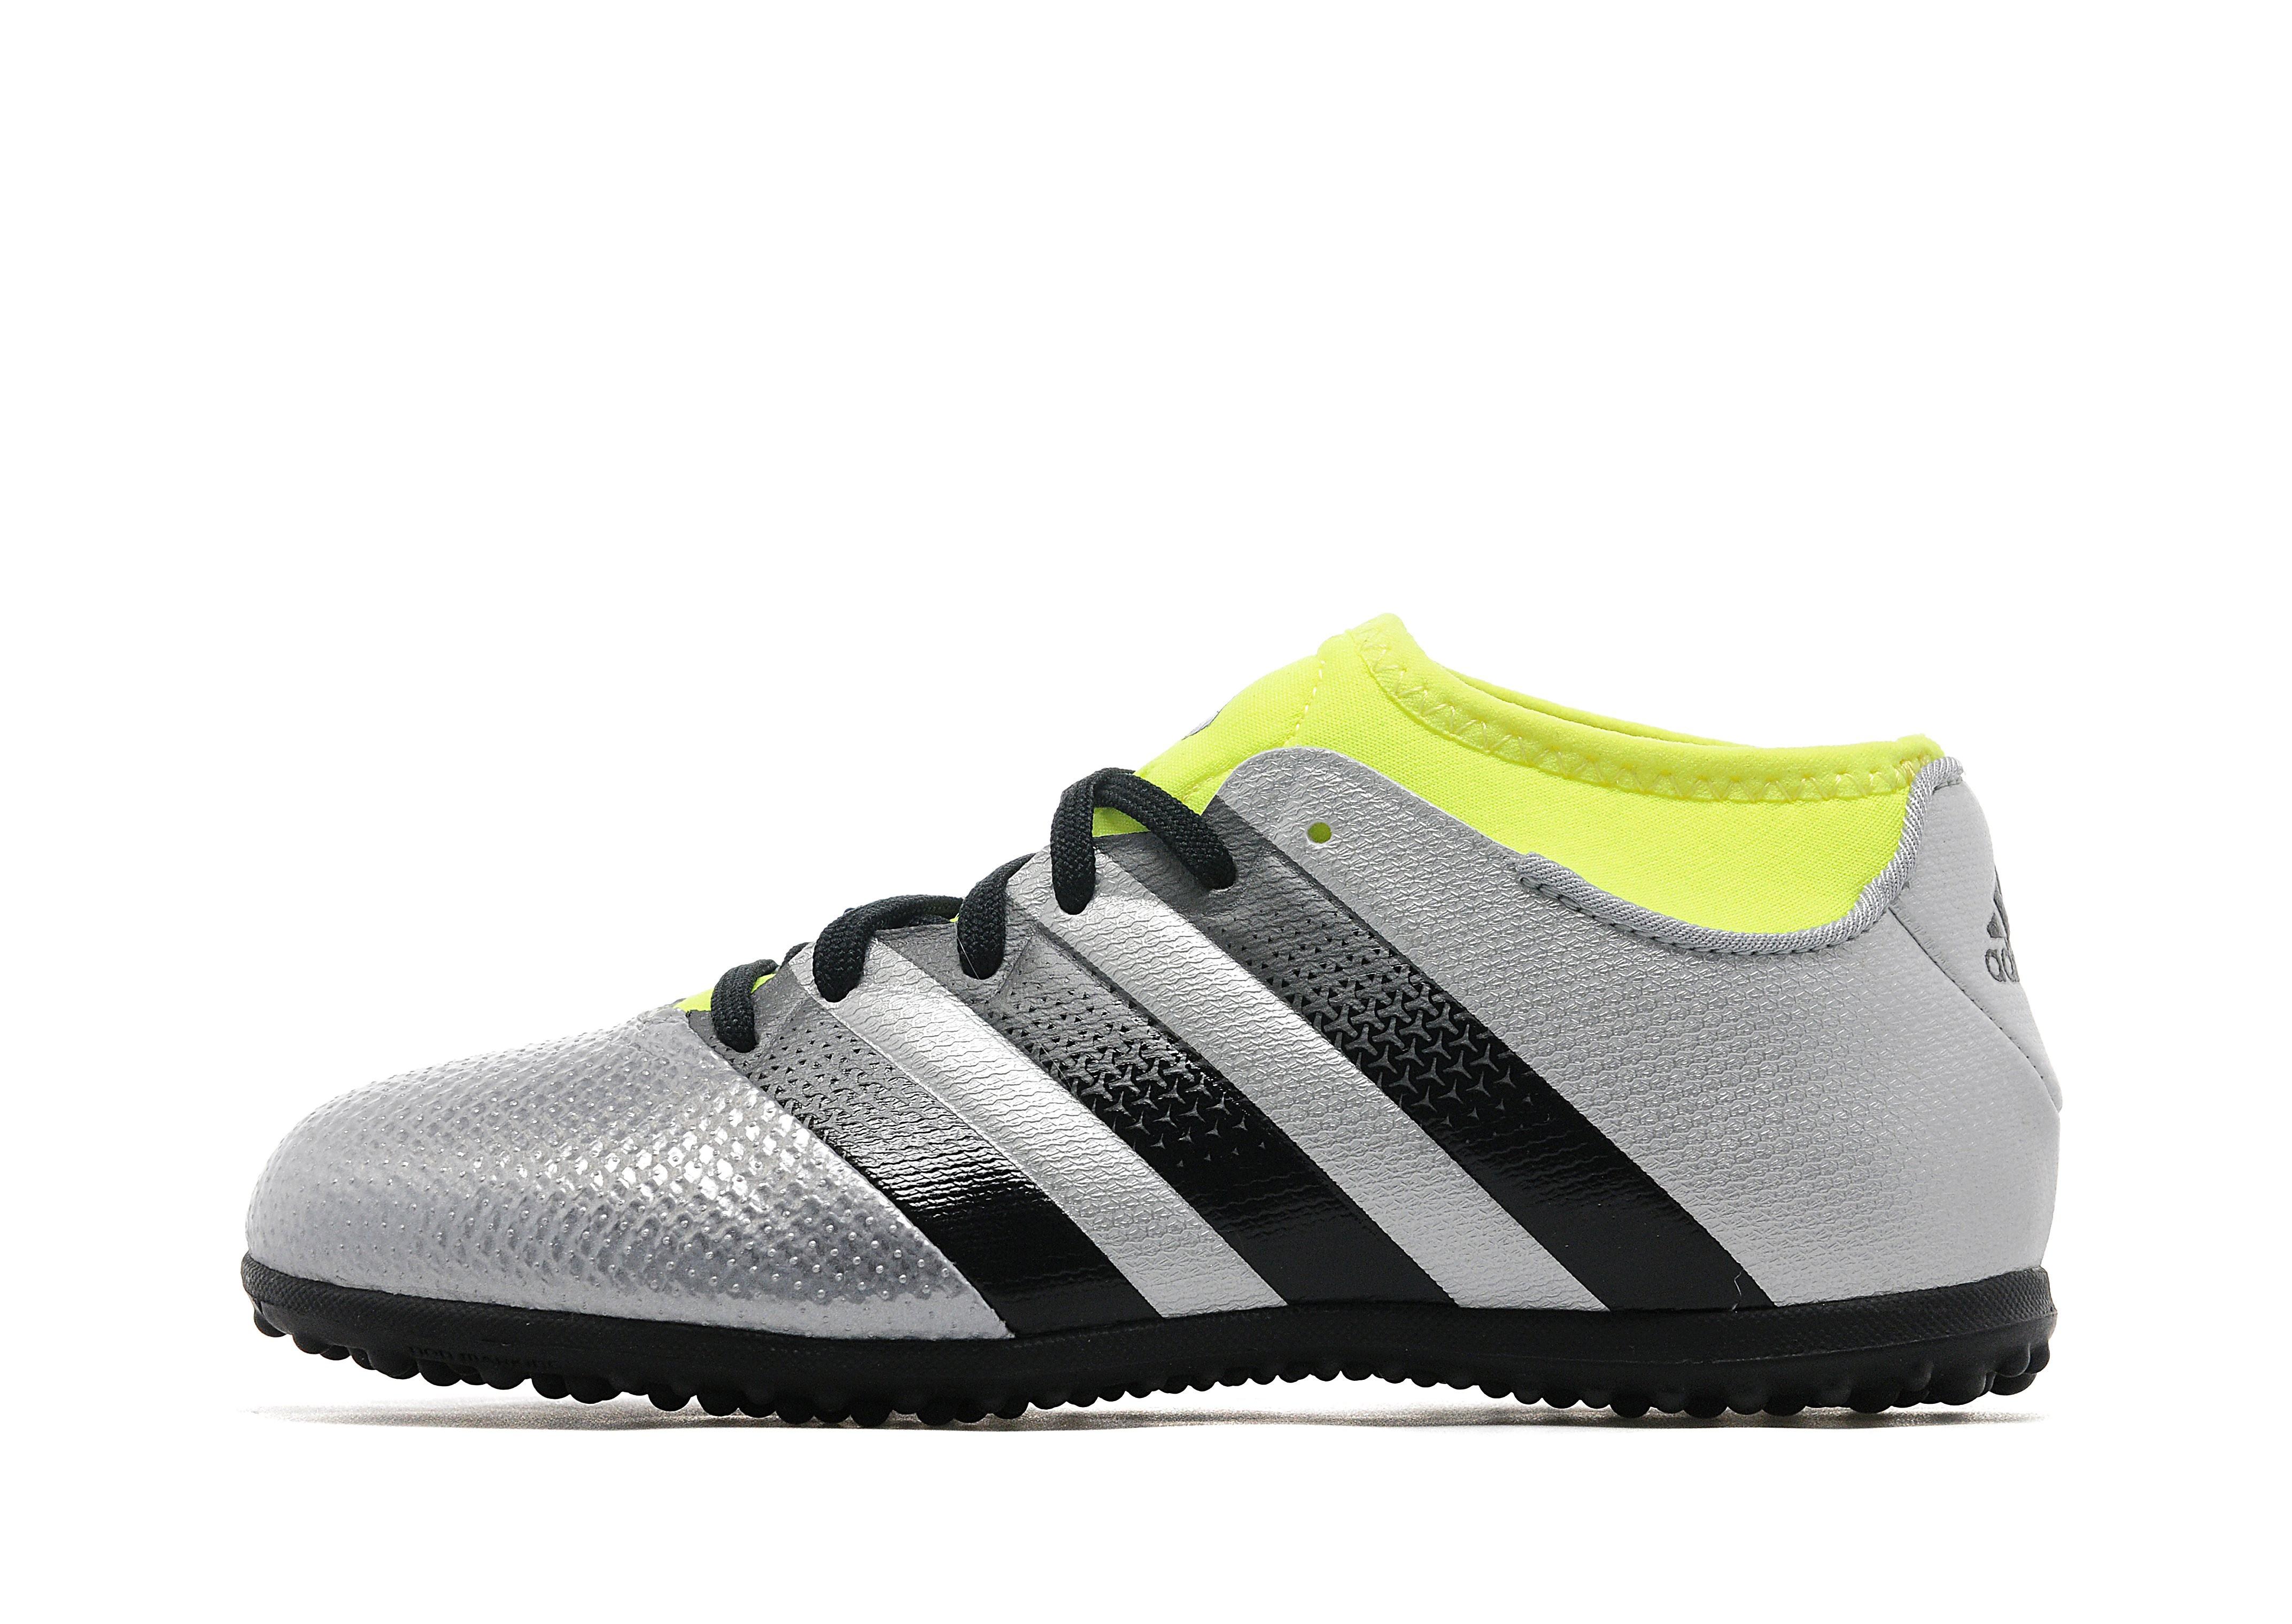 f88f8ac249f ... soccer shoe revup sports fcd1d eeaf5  spain adidas ace 16.3 turf  children silver kids sports king store aacb1 c6f45